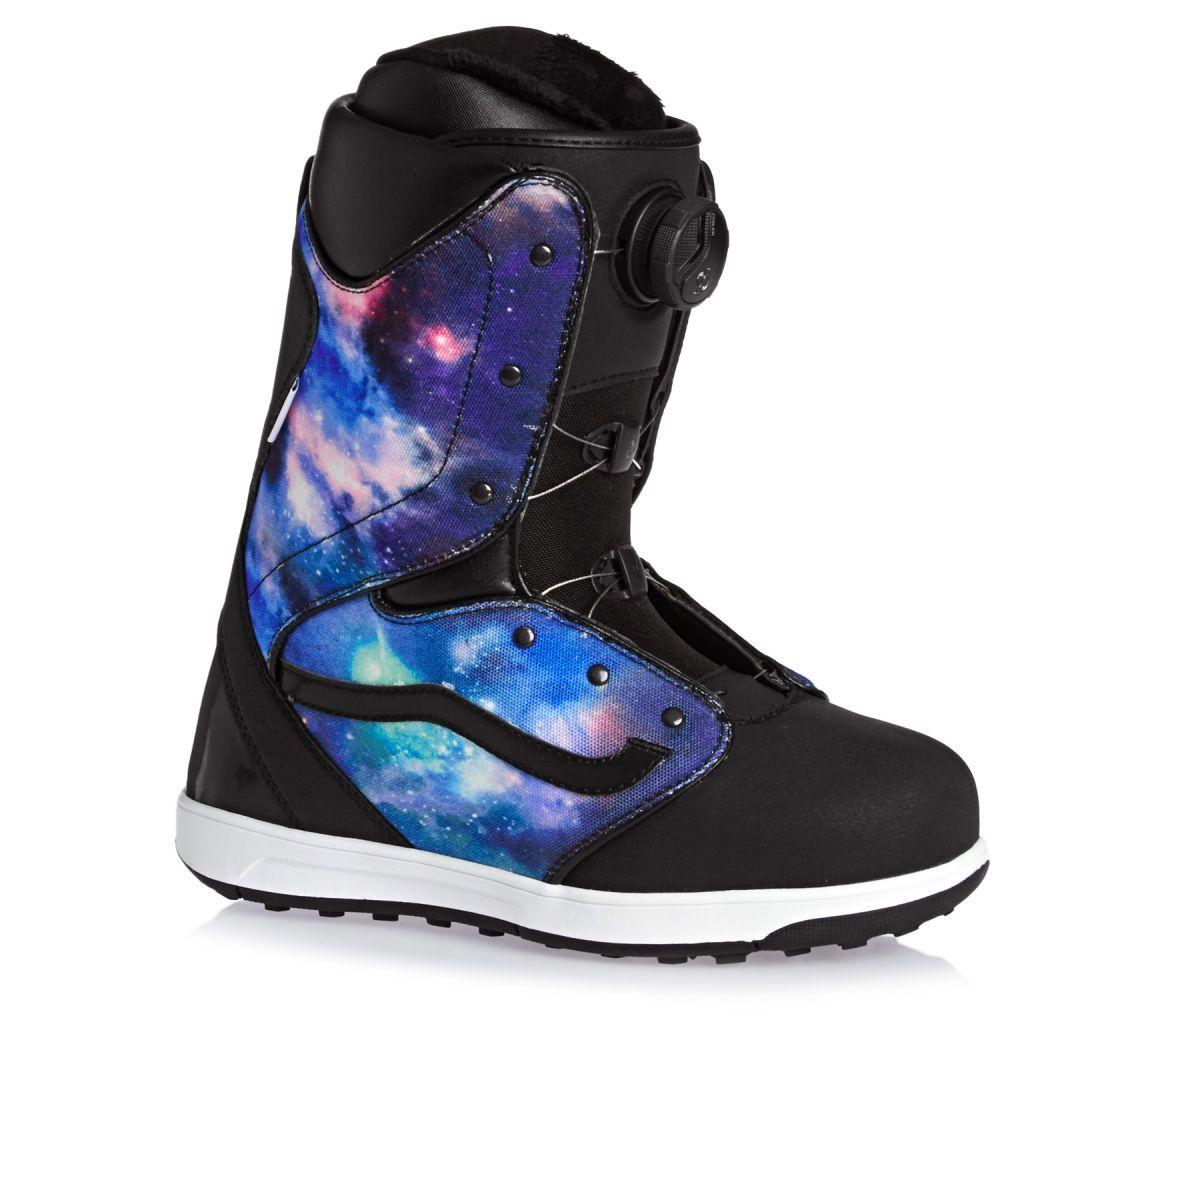 Vans Encore Snowboard Boots - Galaxy/Black